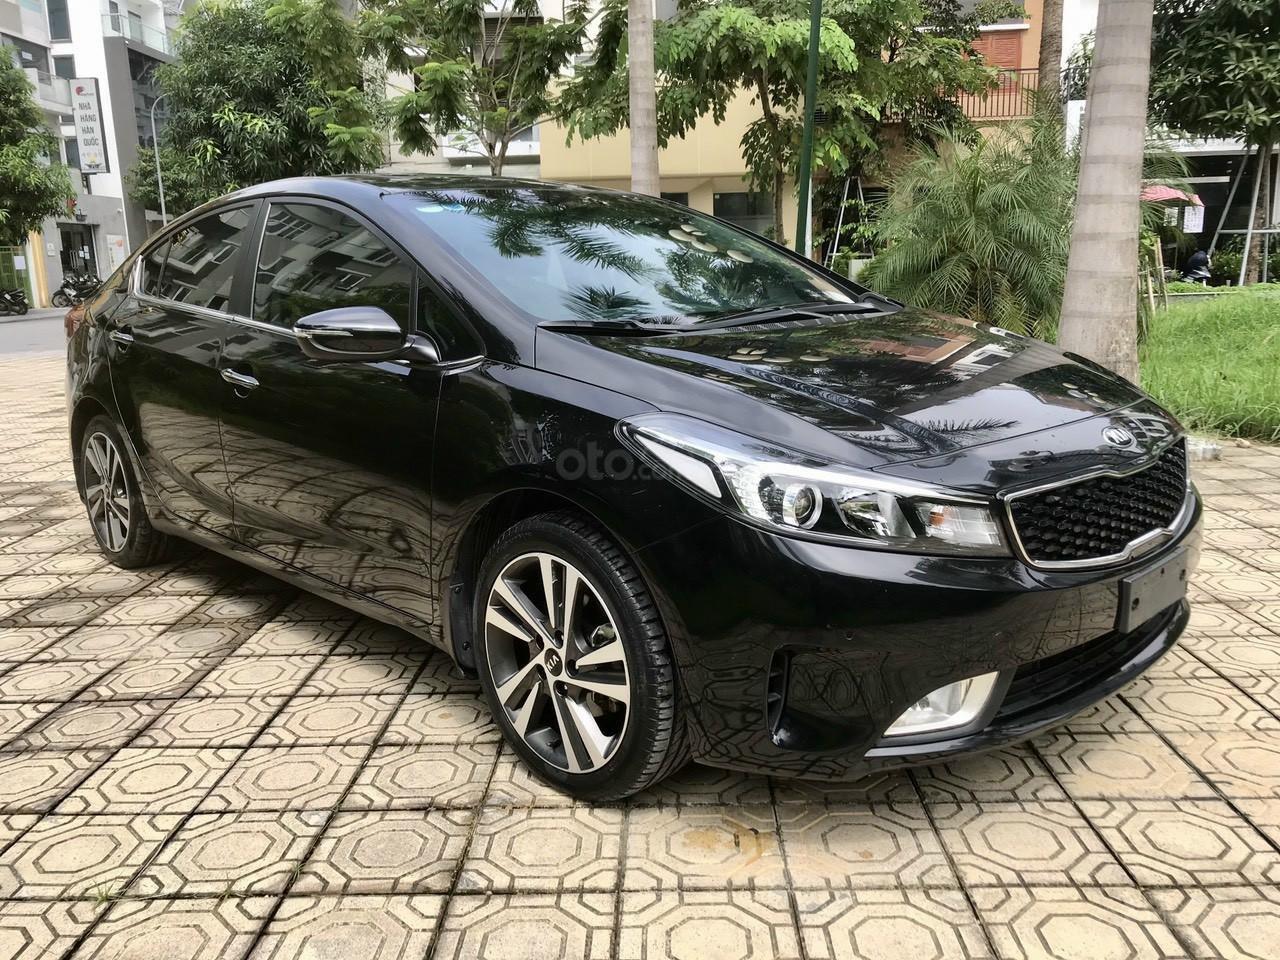 Cần bán lại xe Kia Cerato đời 2017 (7)